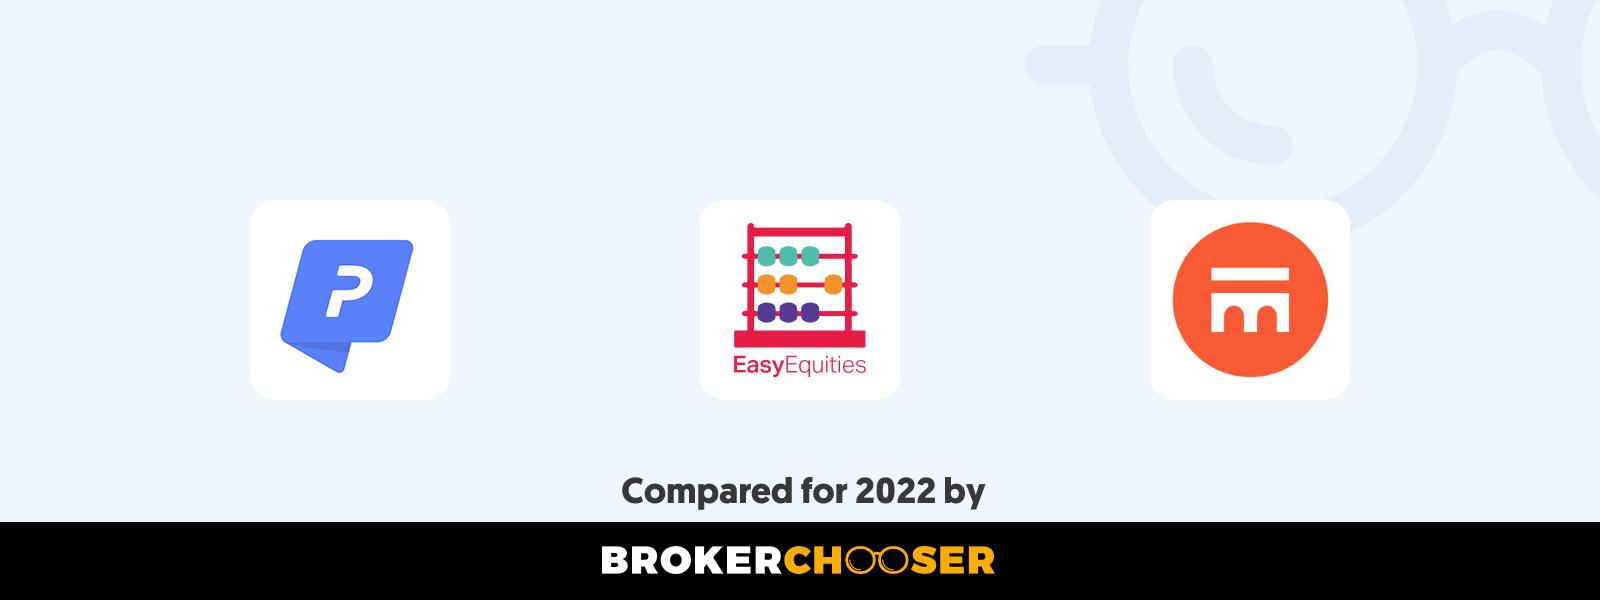 Best brokers for beginners in Morocco in 2020